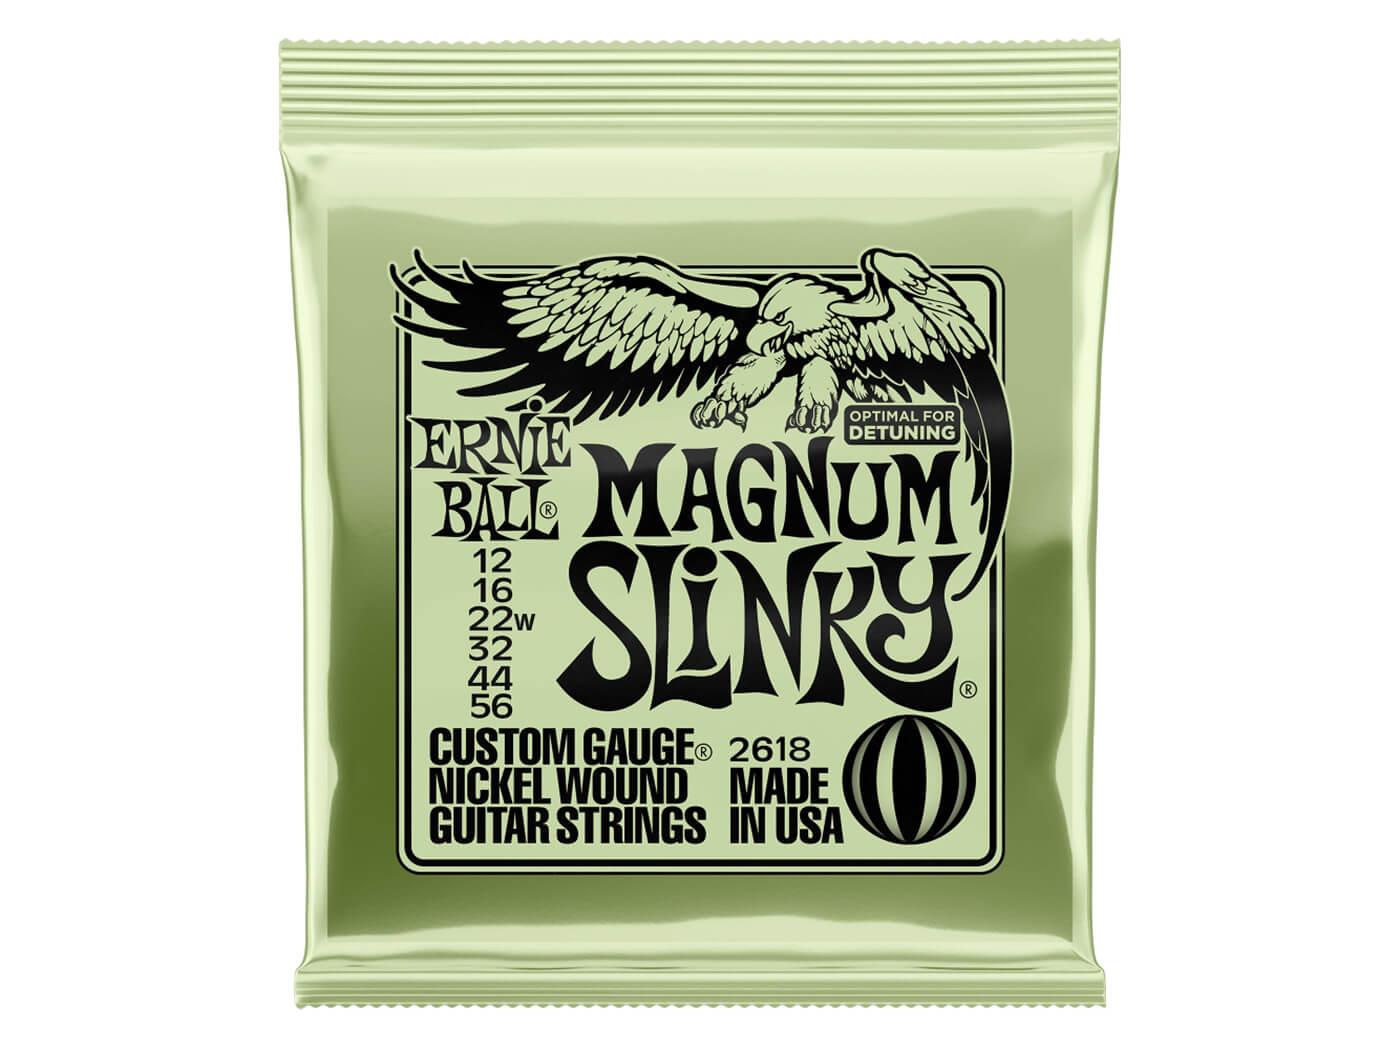 Ernie Ball Magnum Slinky Nickel Wound Electric Guitar Strings